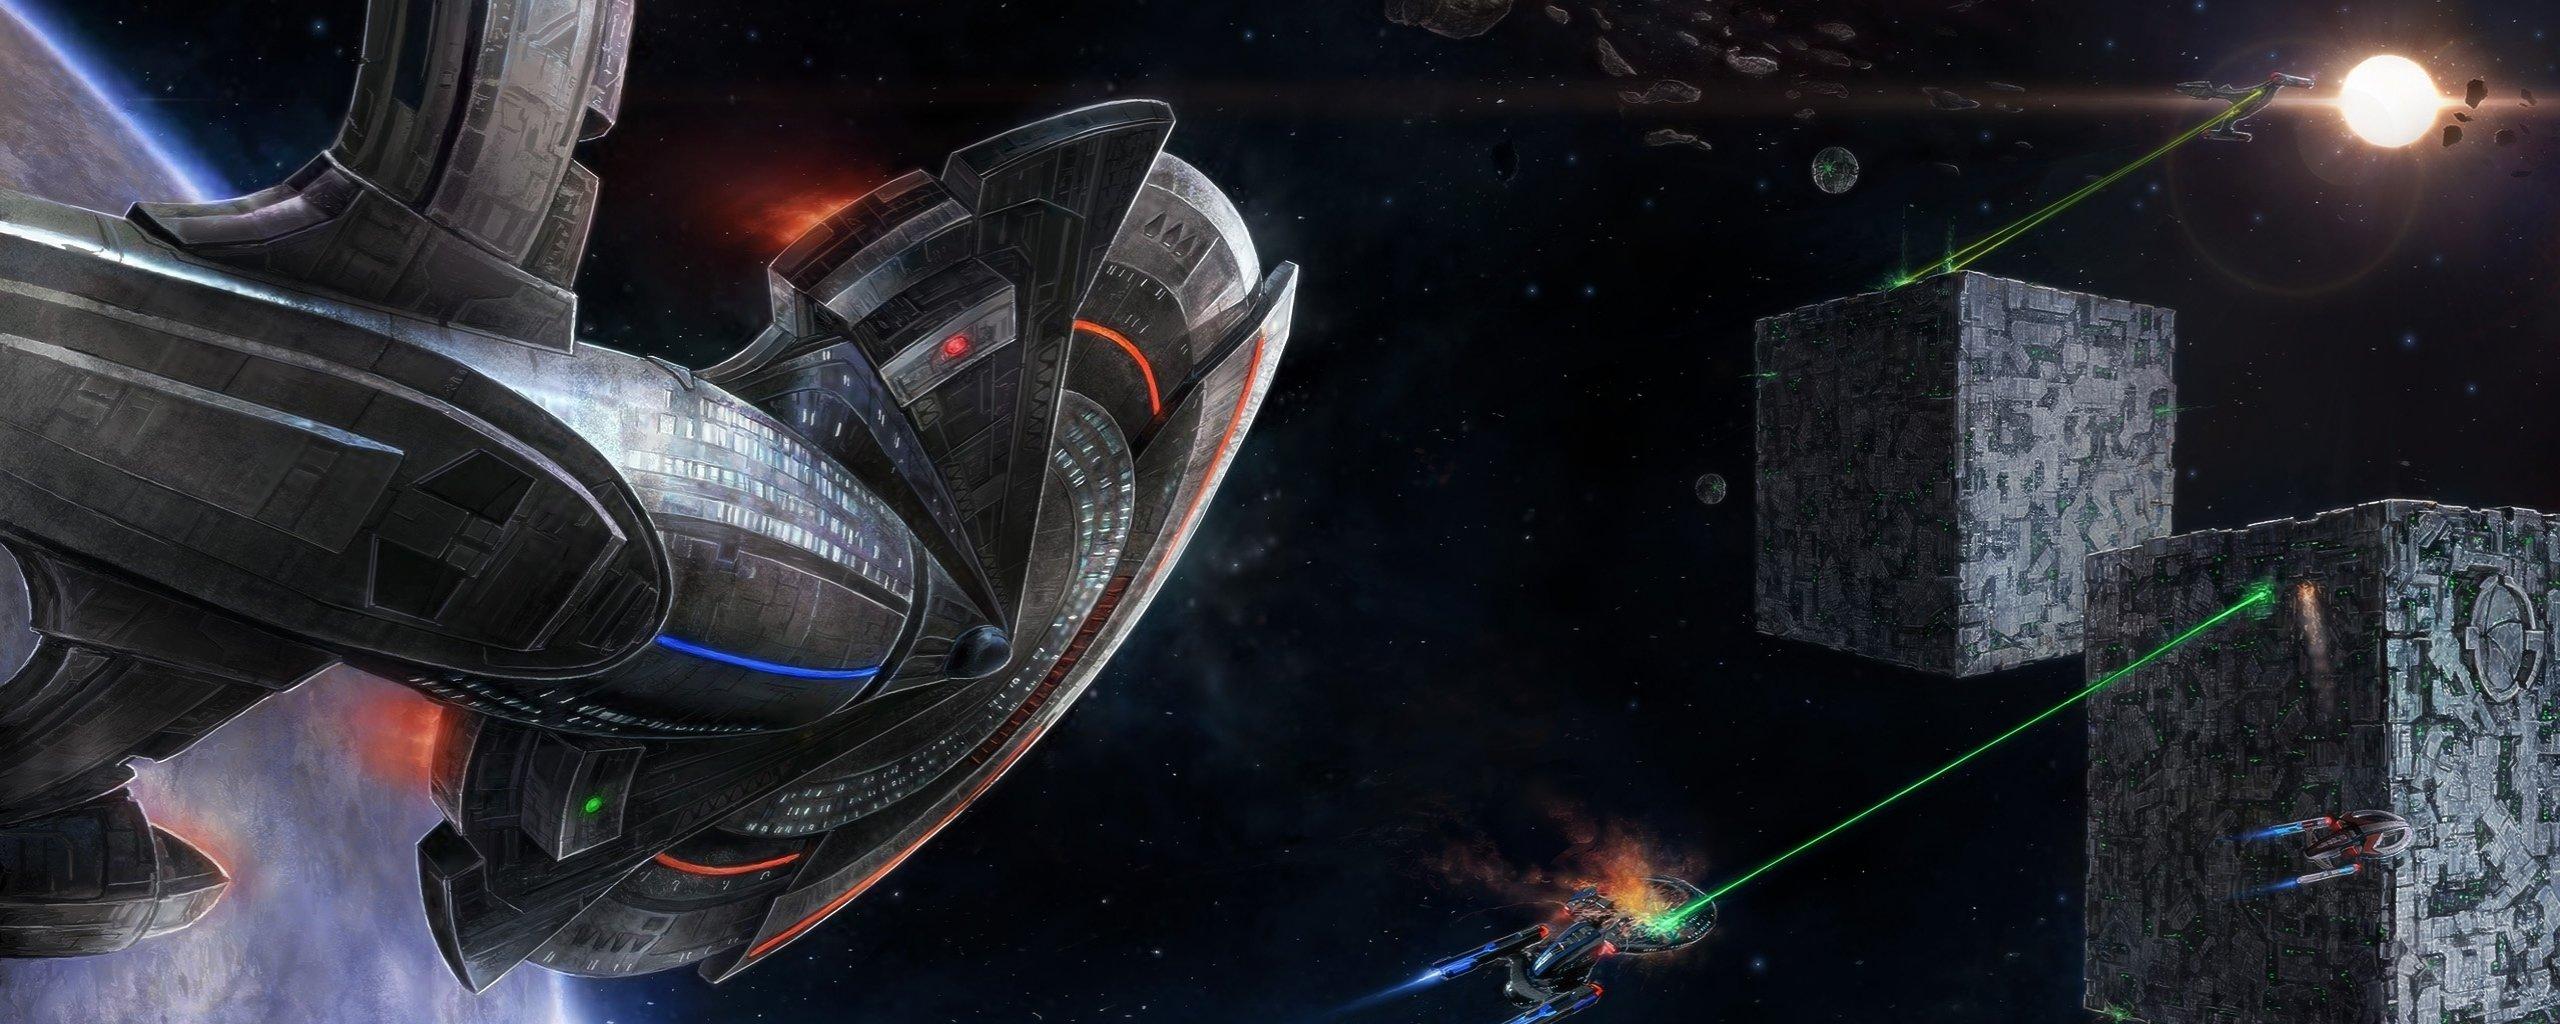 Awesome Star Trek Video Game Free Wallpaper ID276311 For Dual Screen 2560x1024 Desktop